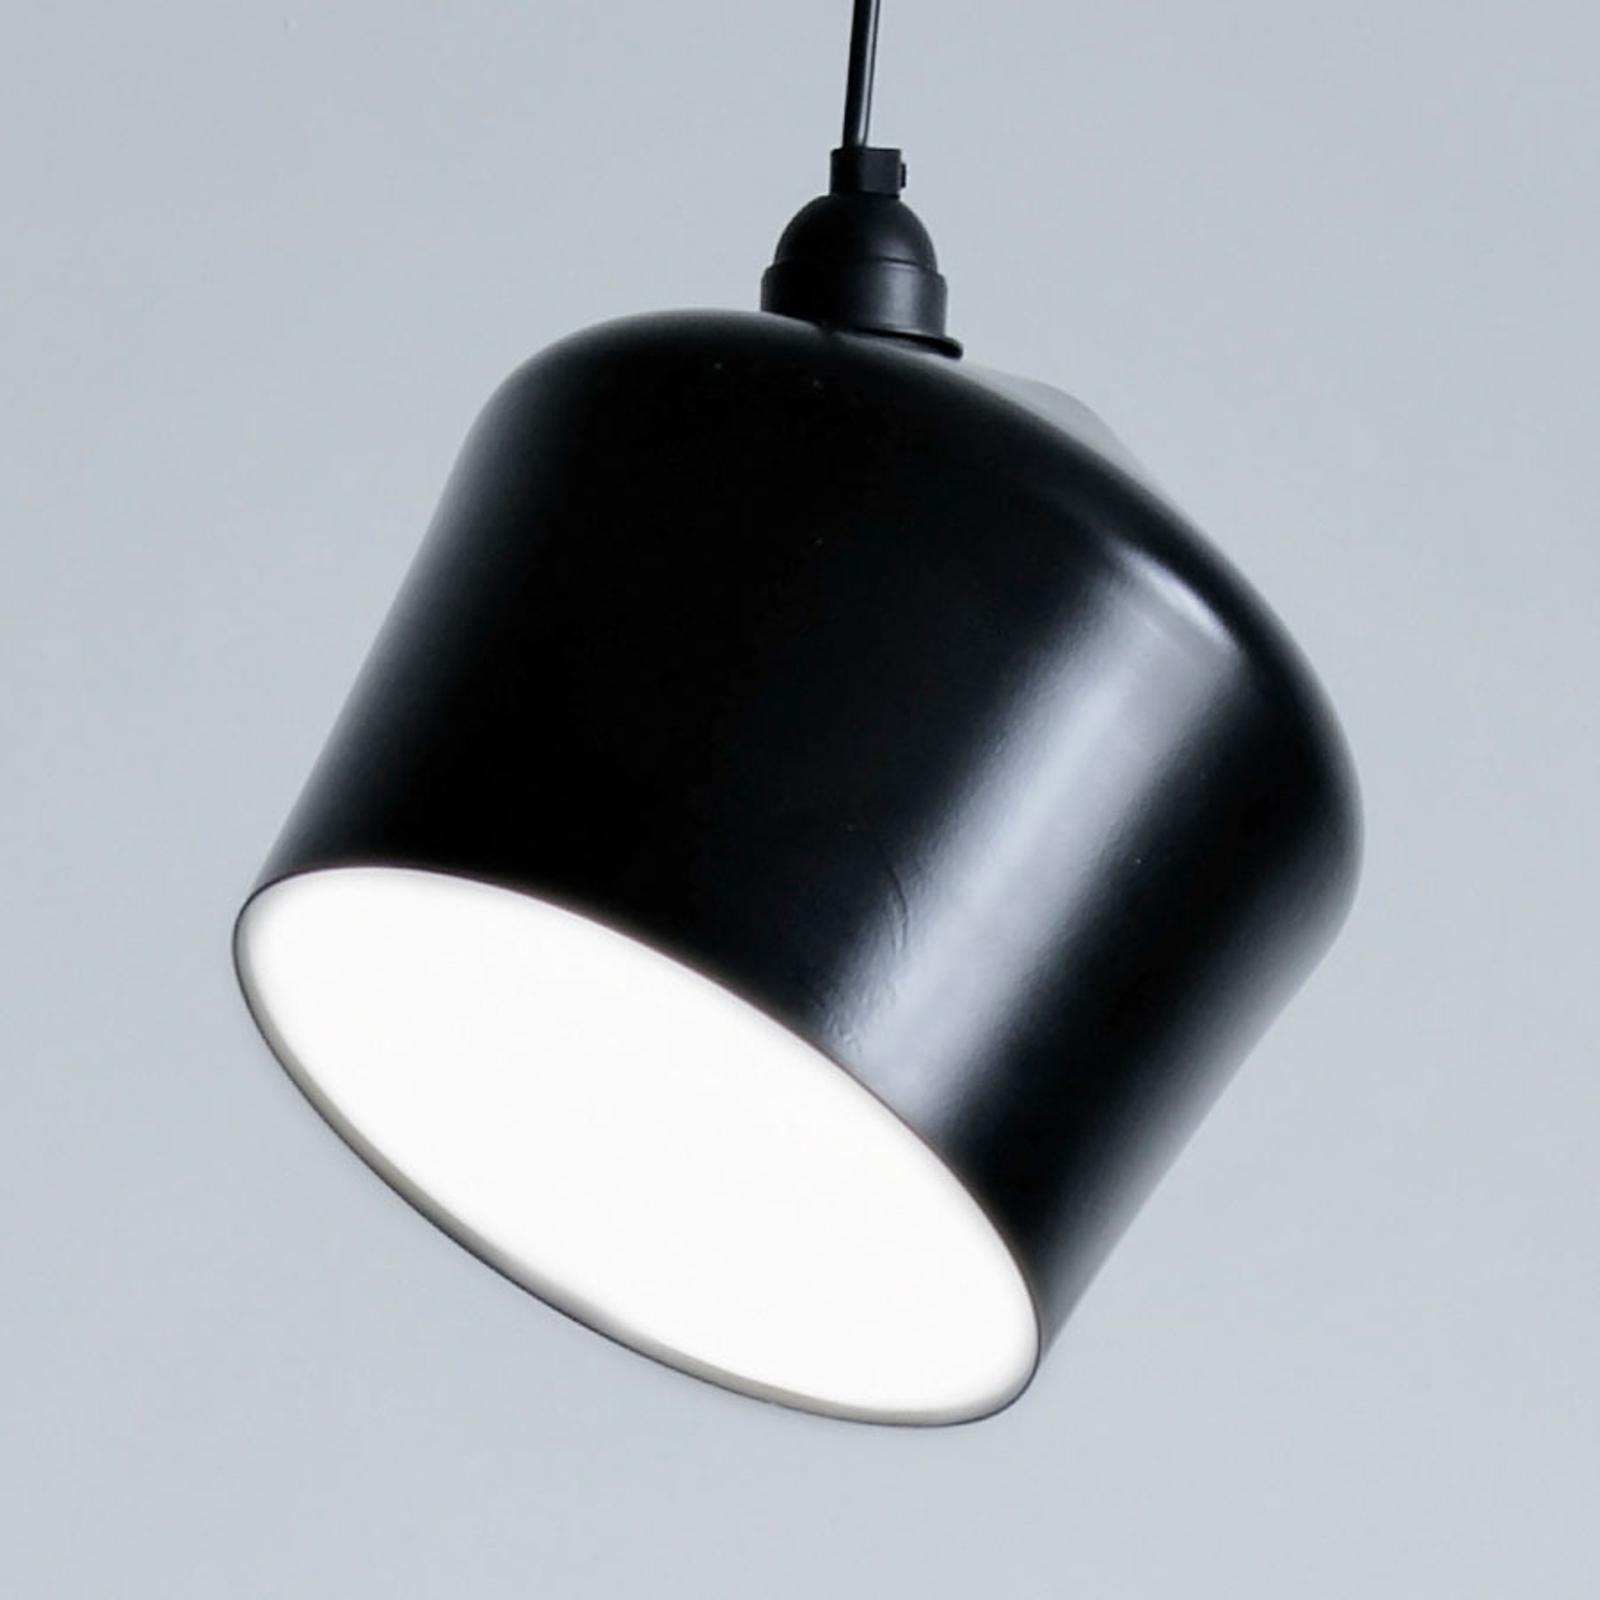 Innolux Pasila design hanglamp zwart